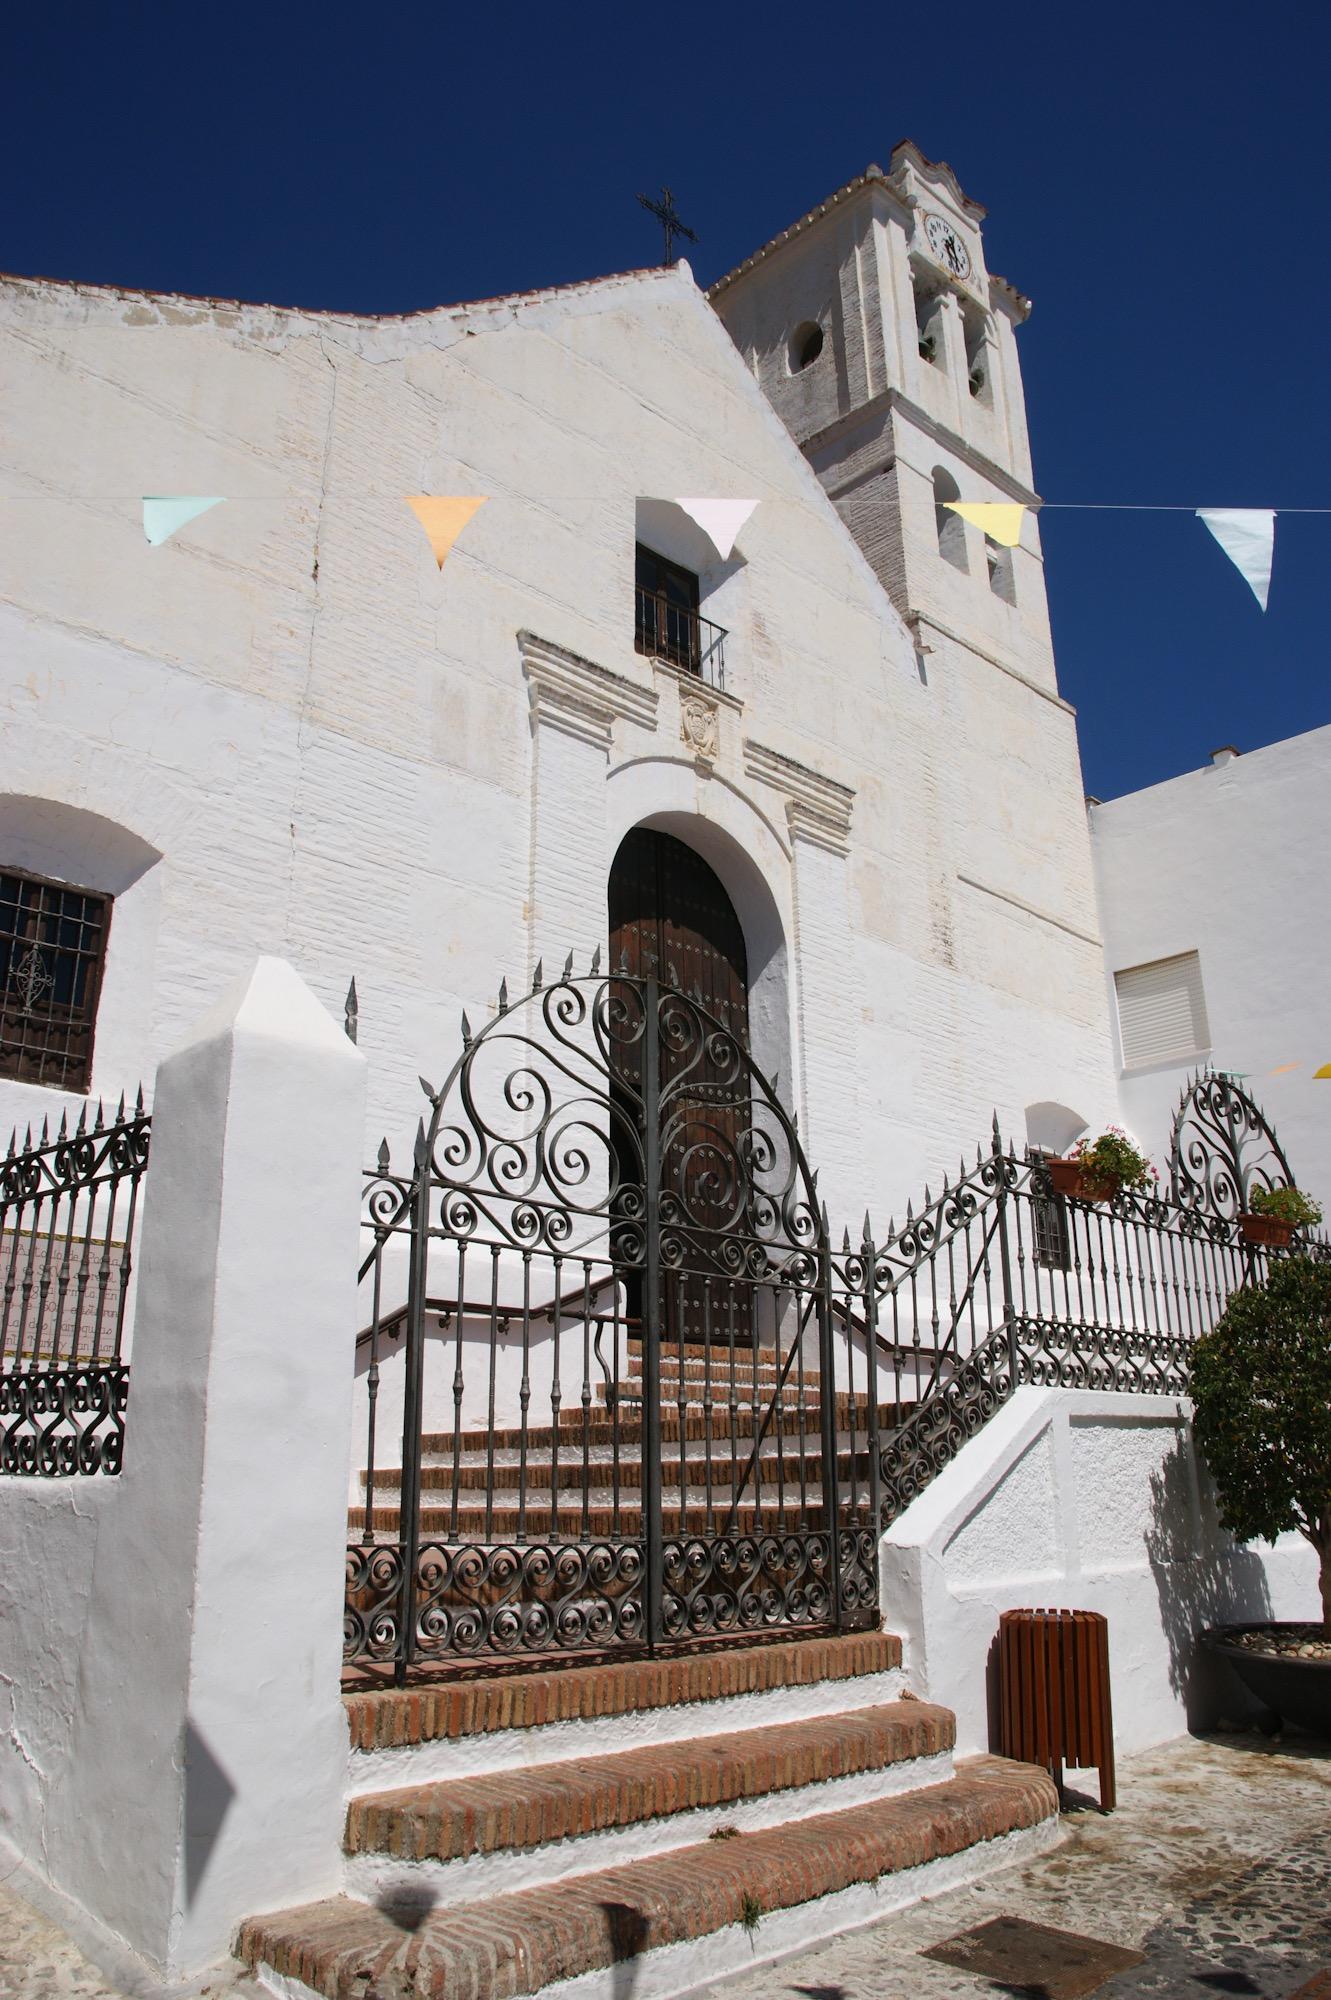 Frigiliana Reisebericht Spanien Andalusien Reise